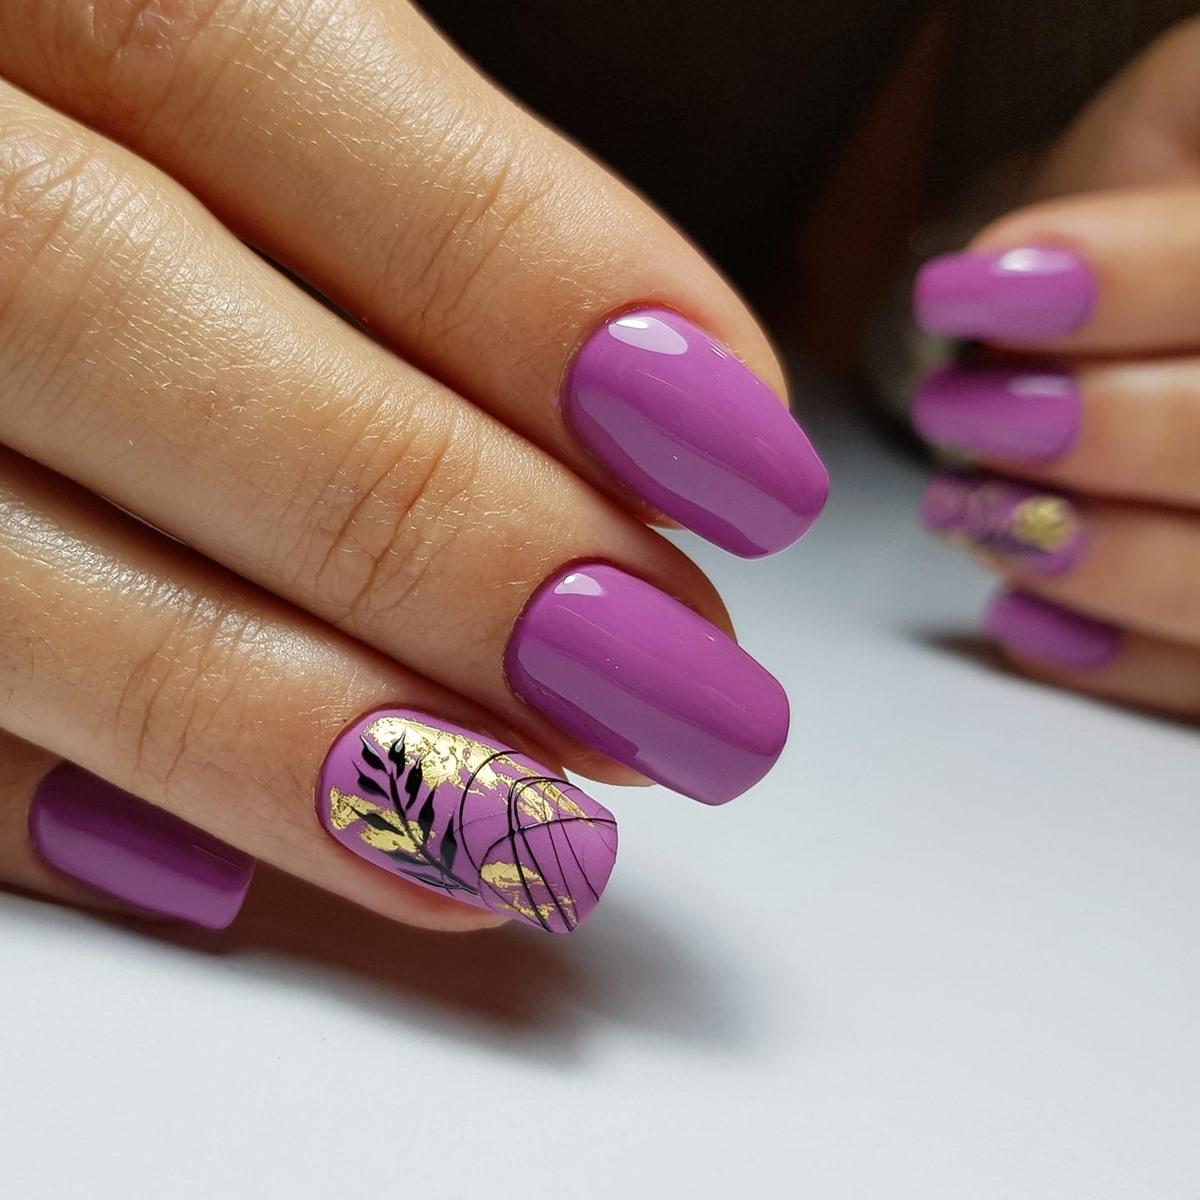 fioletowe paznokcie zdjęcia